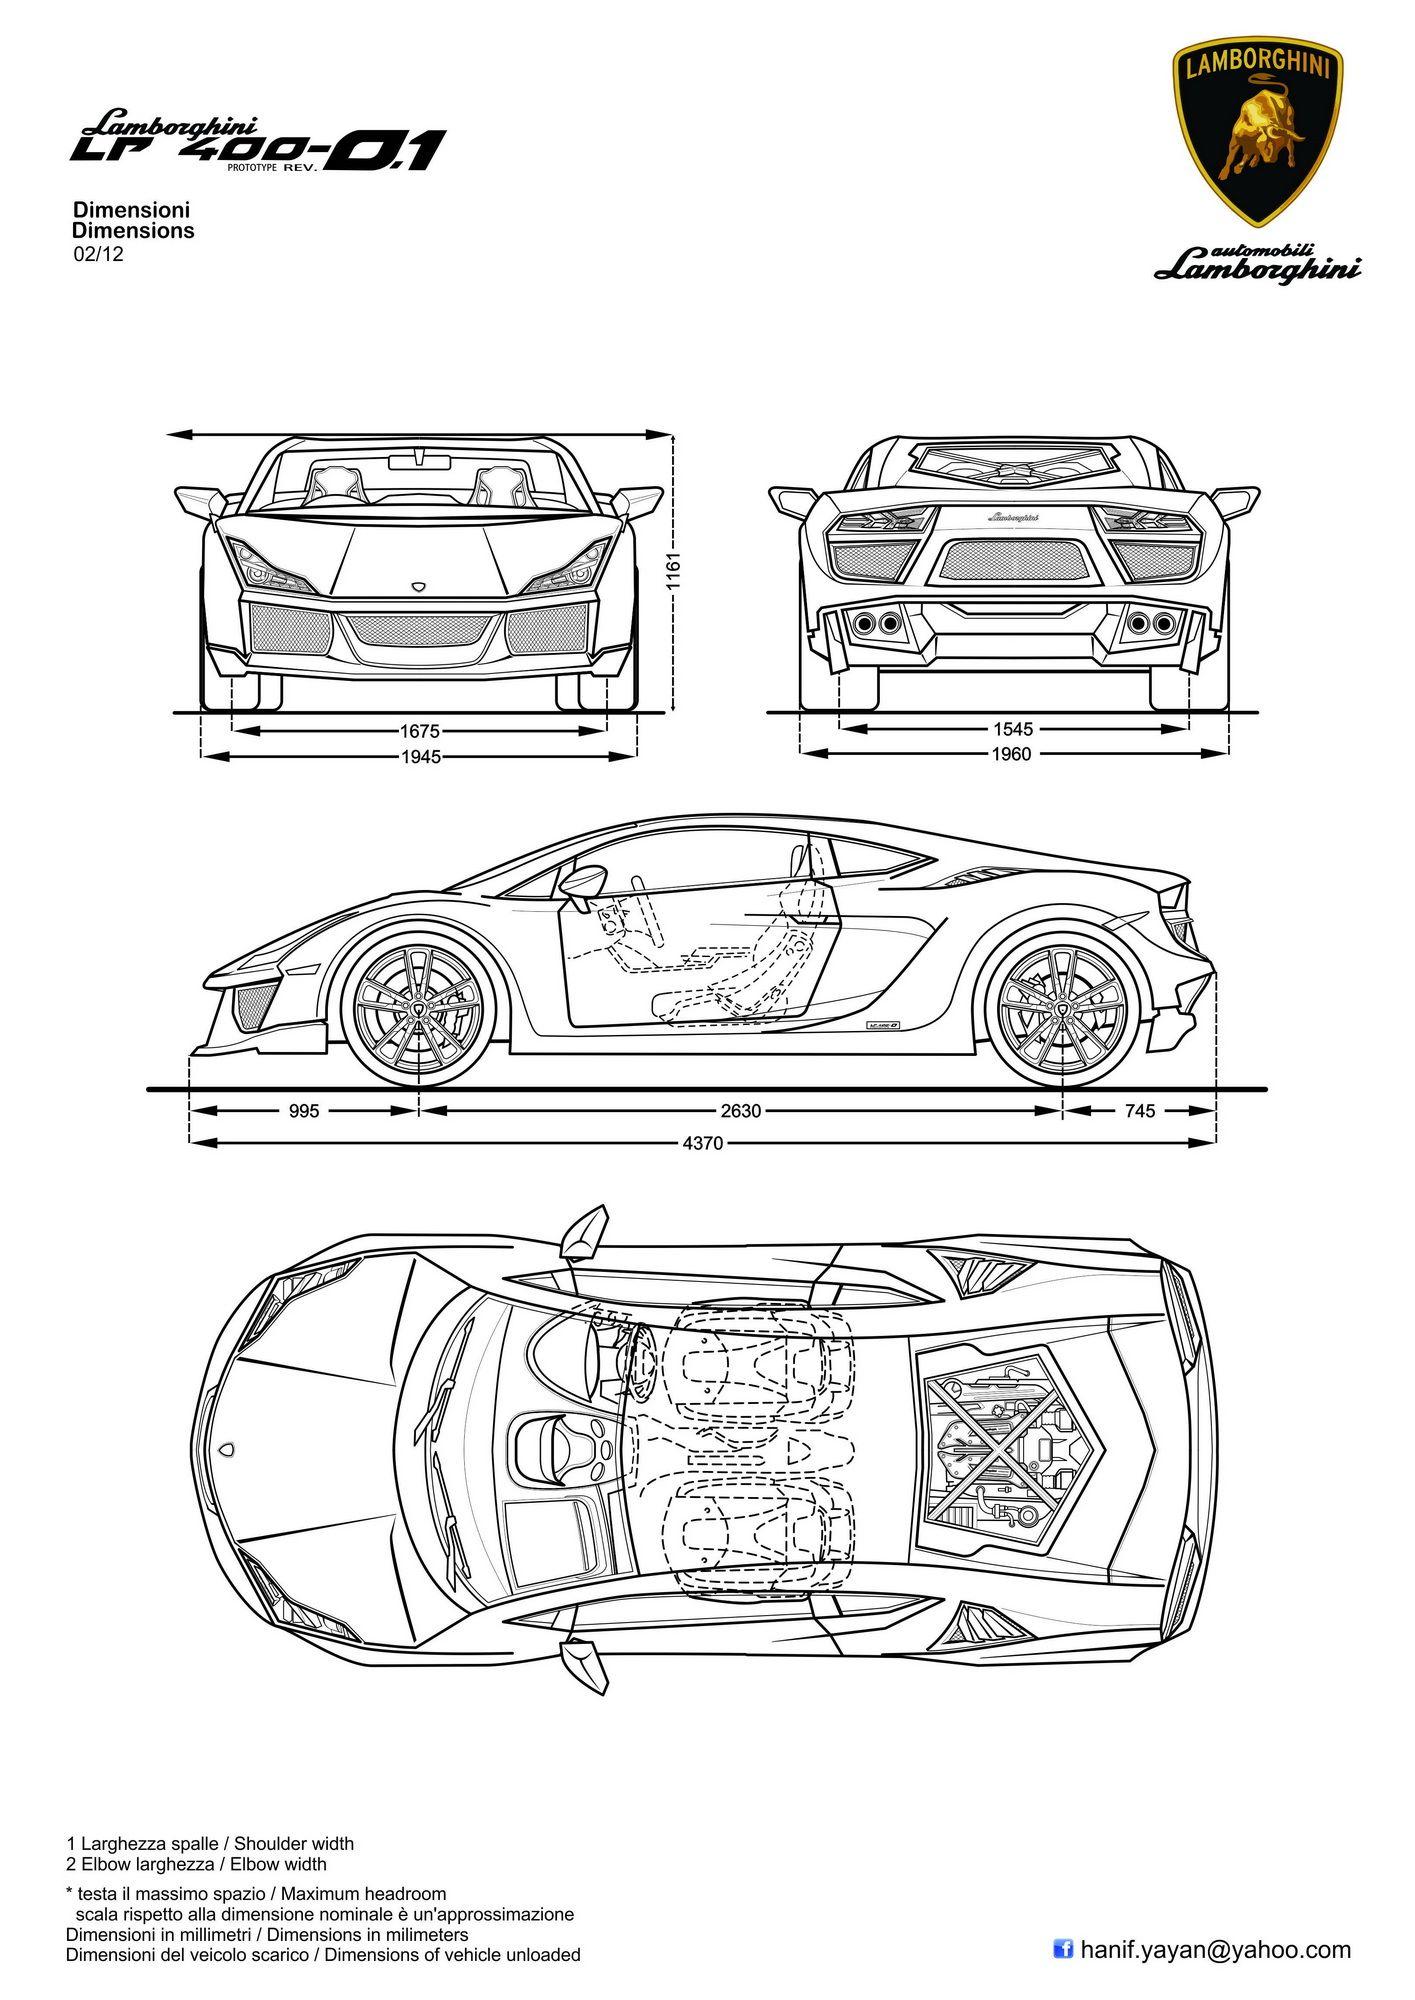 Lamborghini veneno blueprint images for Blueprint sizes